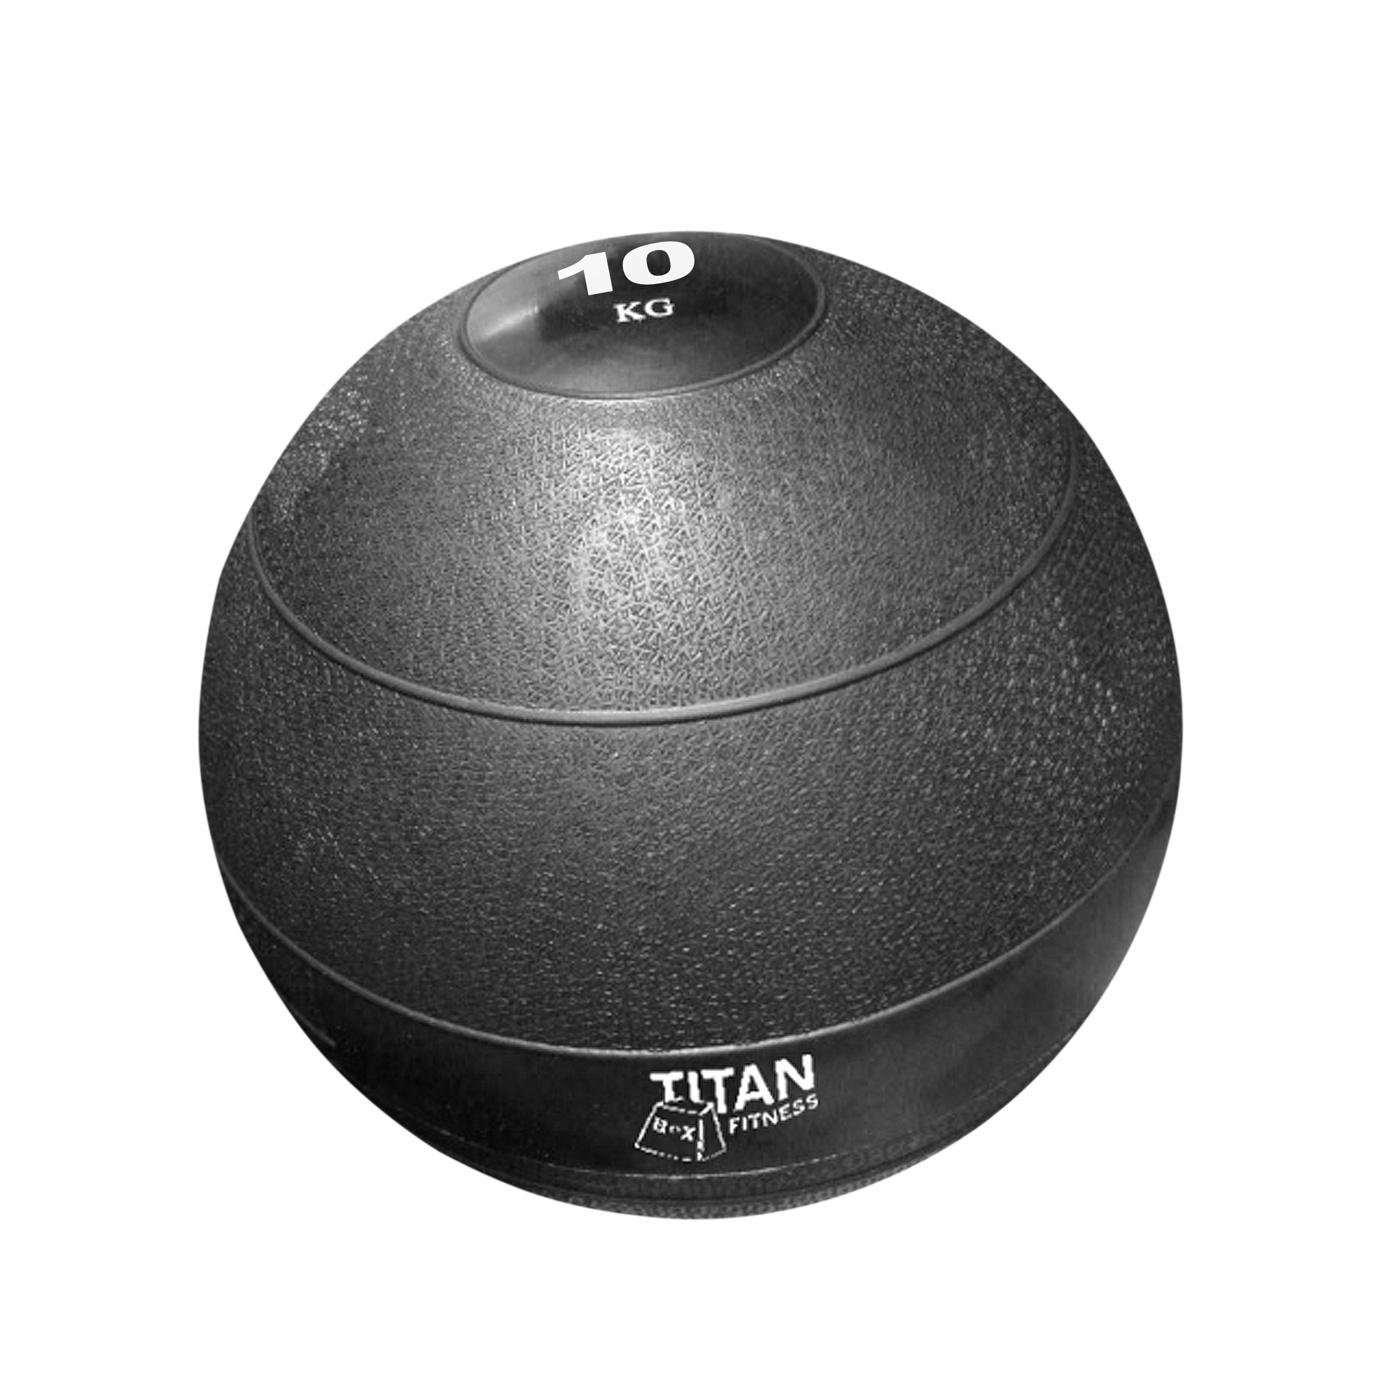 Titan_Box_Slammerball_10kg